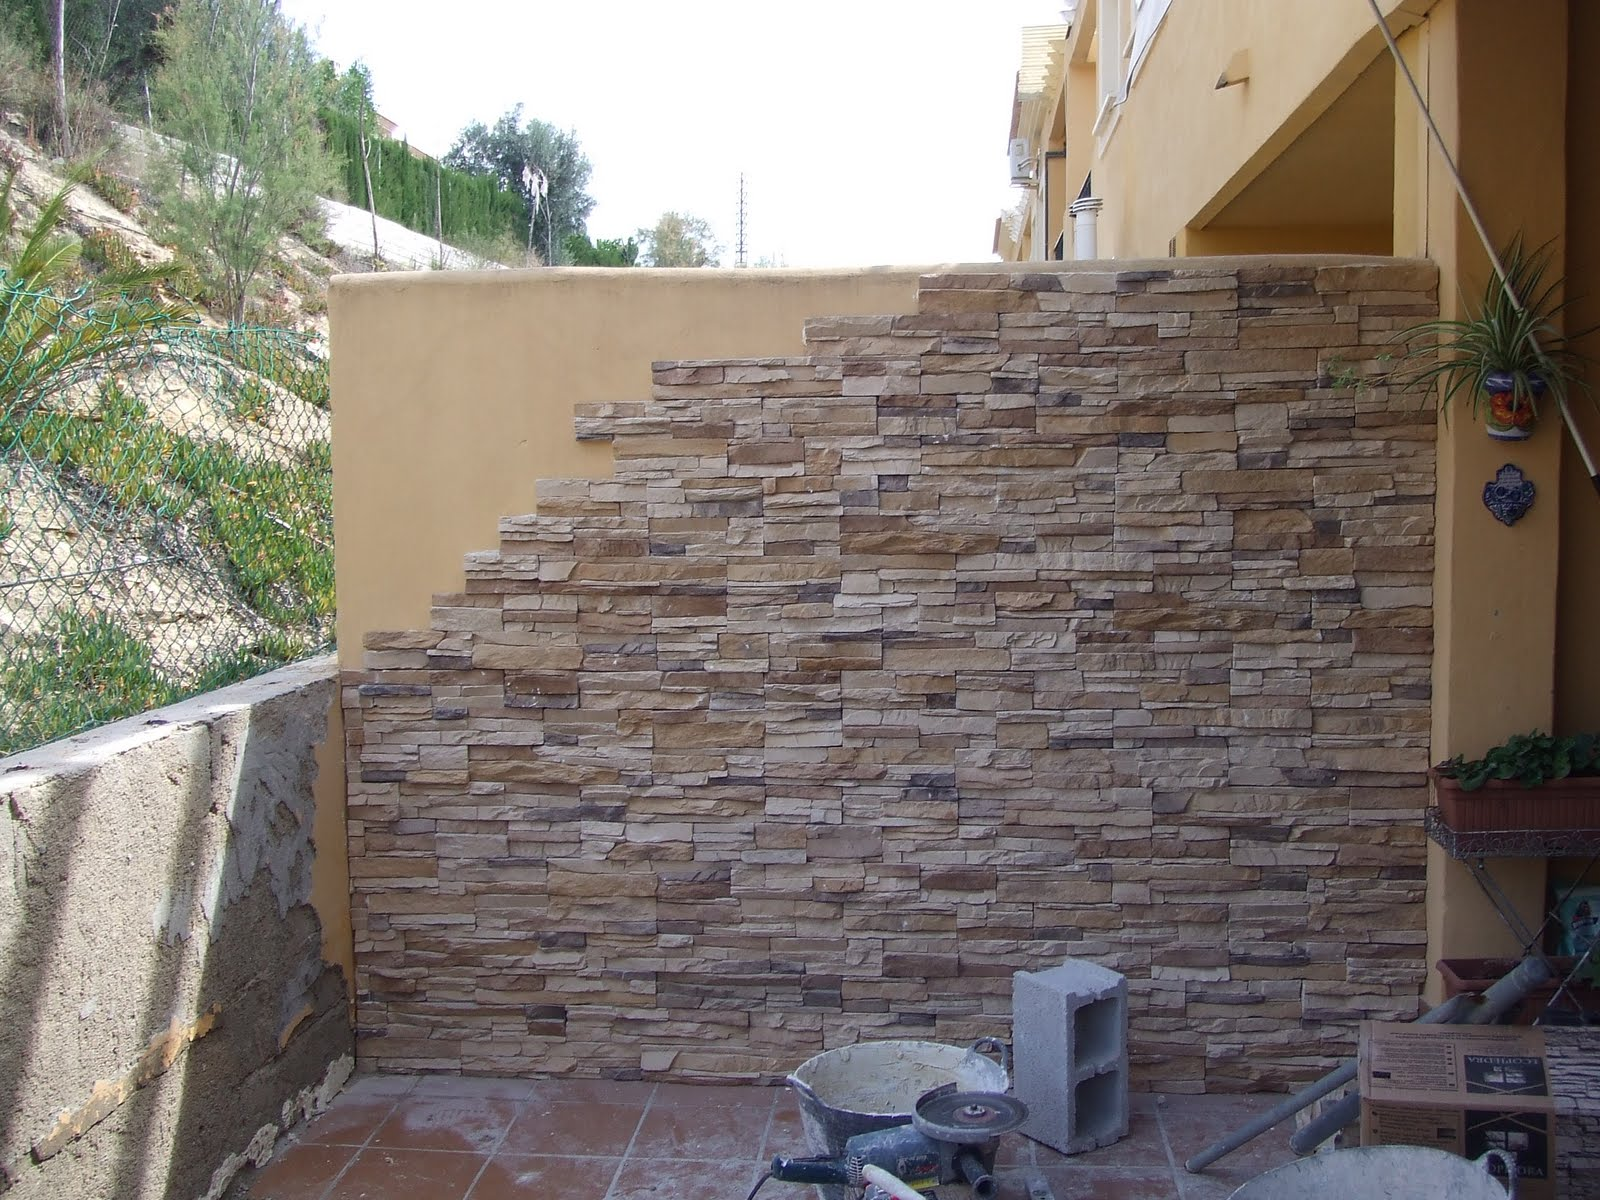 Edifica tus ideas piedra natural - Piedra natural para paredes ...